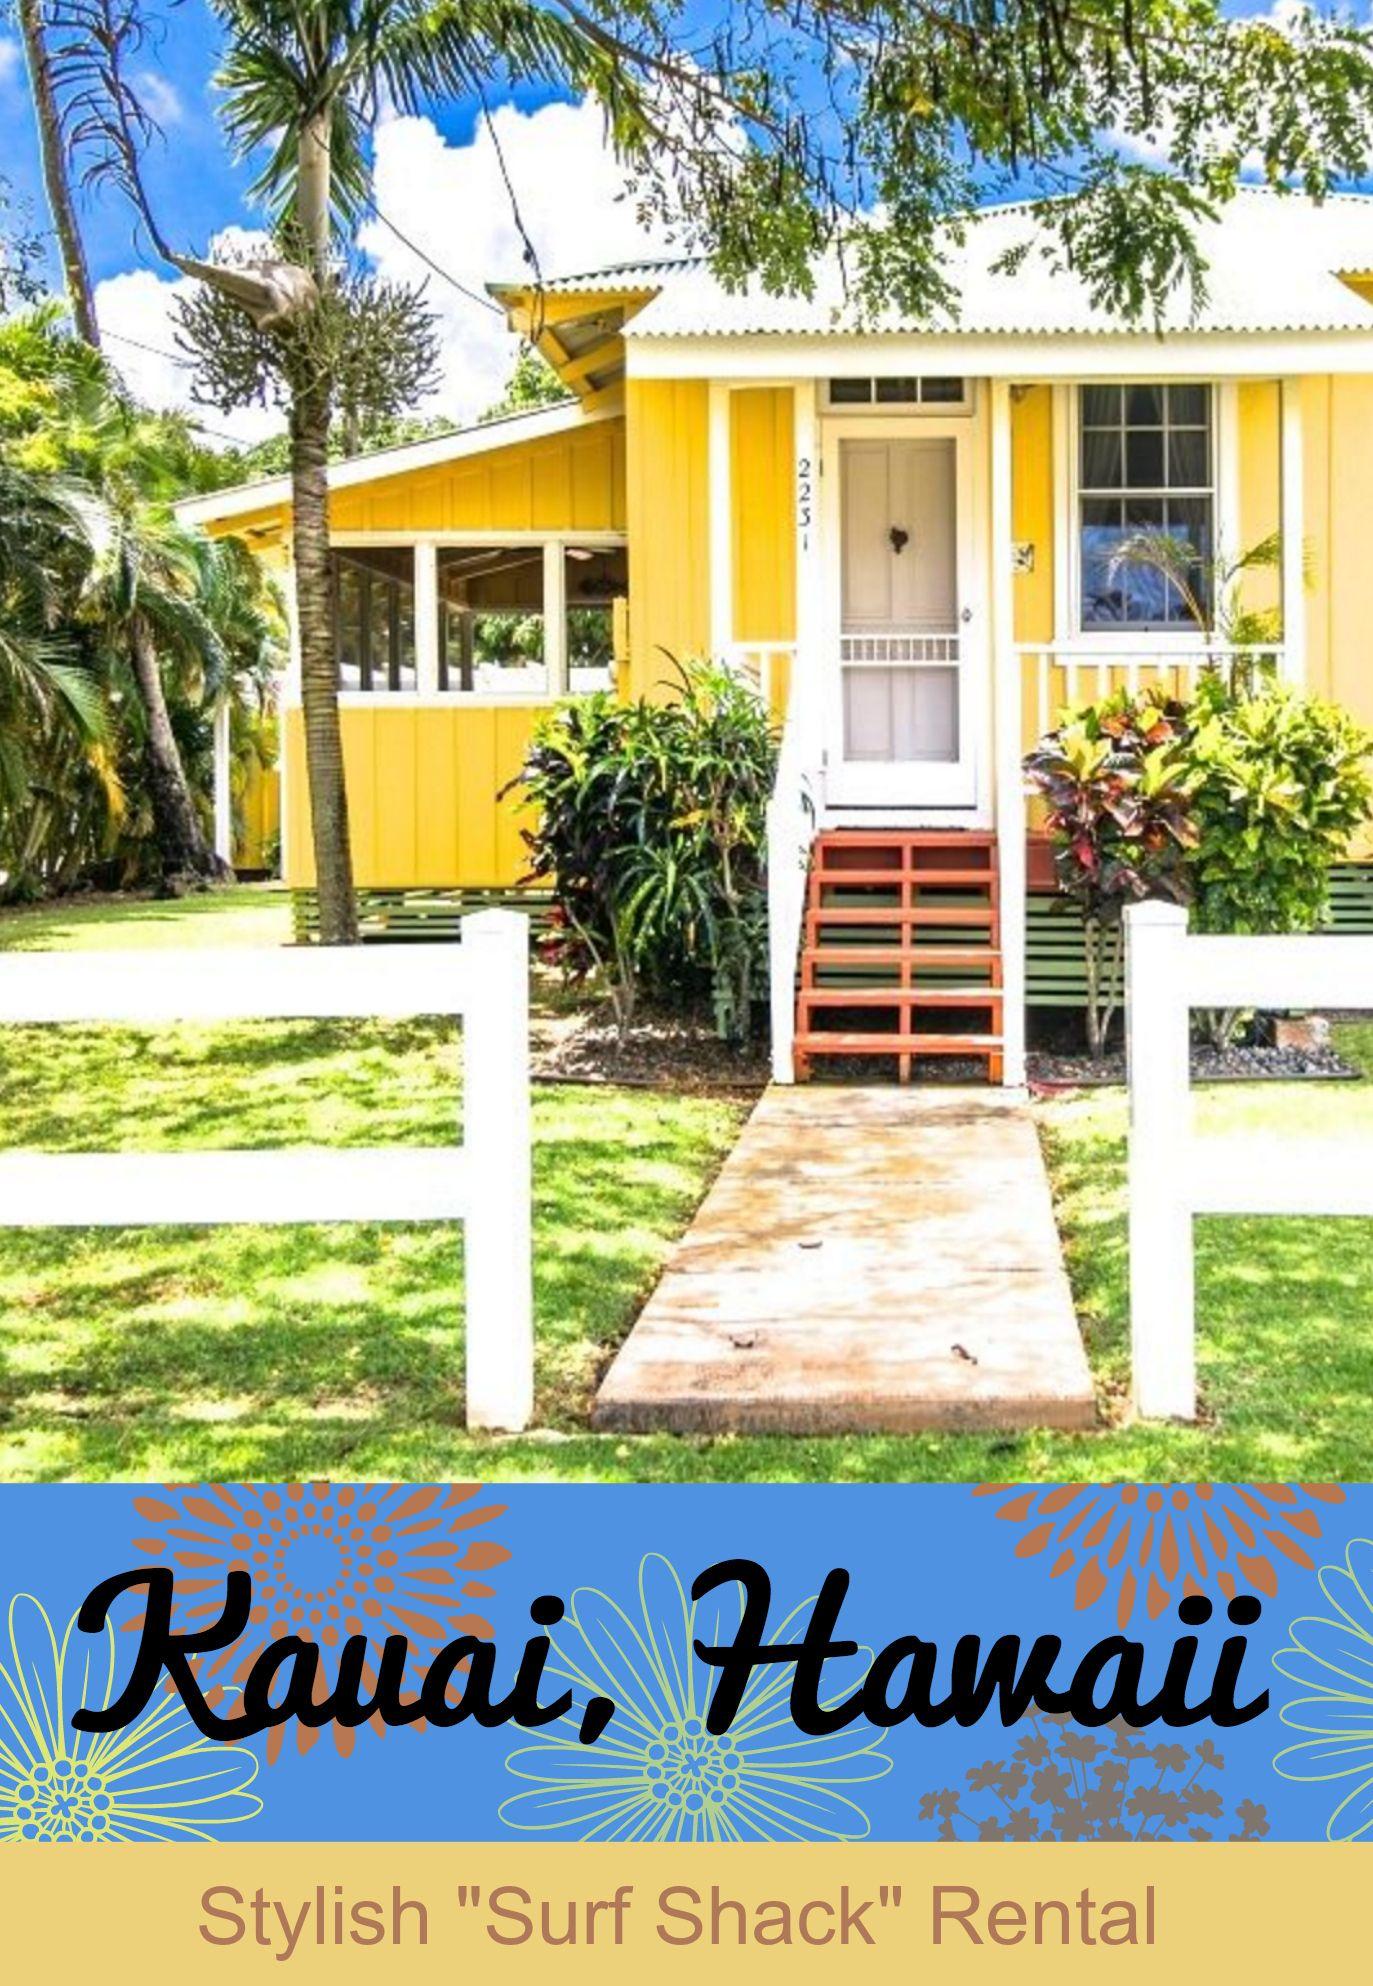 Vacation Rental Kauai Hawaii Rover At Home Hawaii Beach House Beach Cottage Decor Hawaiian Homes